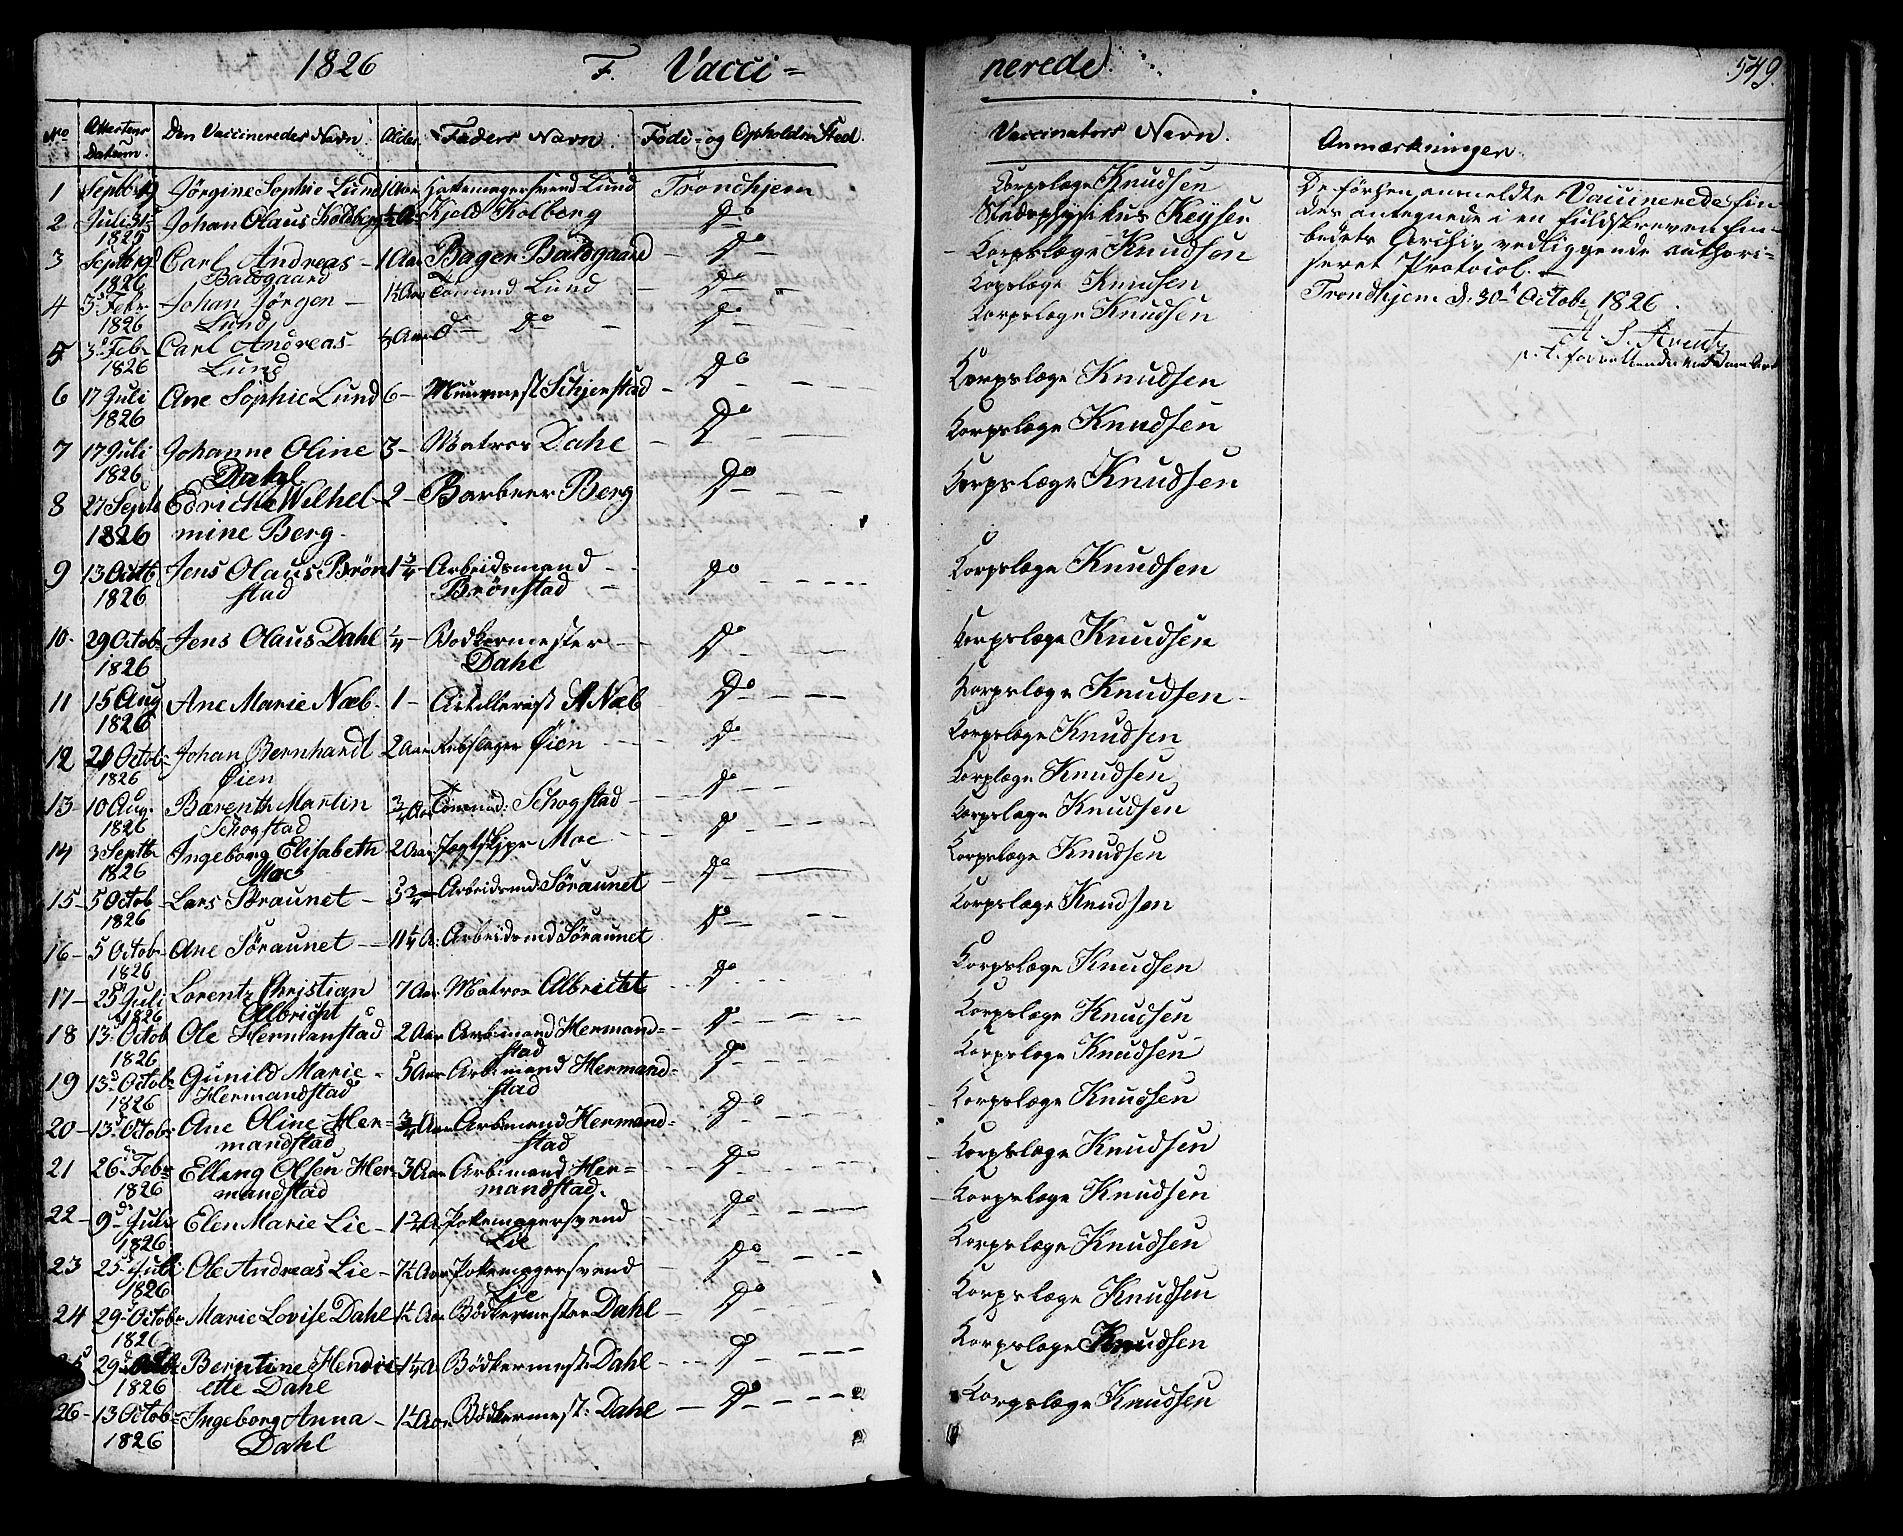 SAT, Ministerialprotokoller, klokkerbøker og fødselsregistre - Sør-Trøndelag, 601/L0045: Parish register (official) no. 601A13, 1821-1831, p. 549